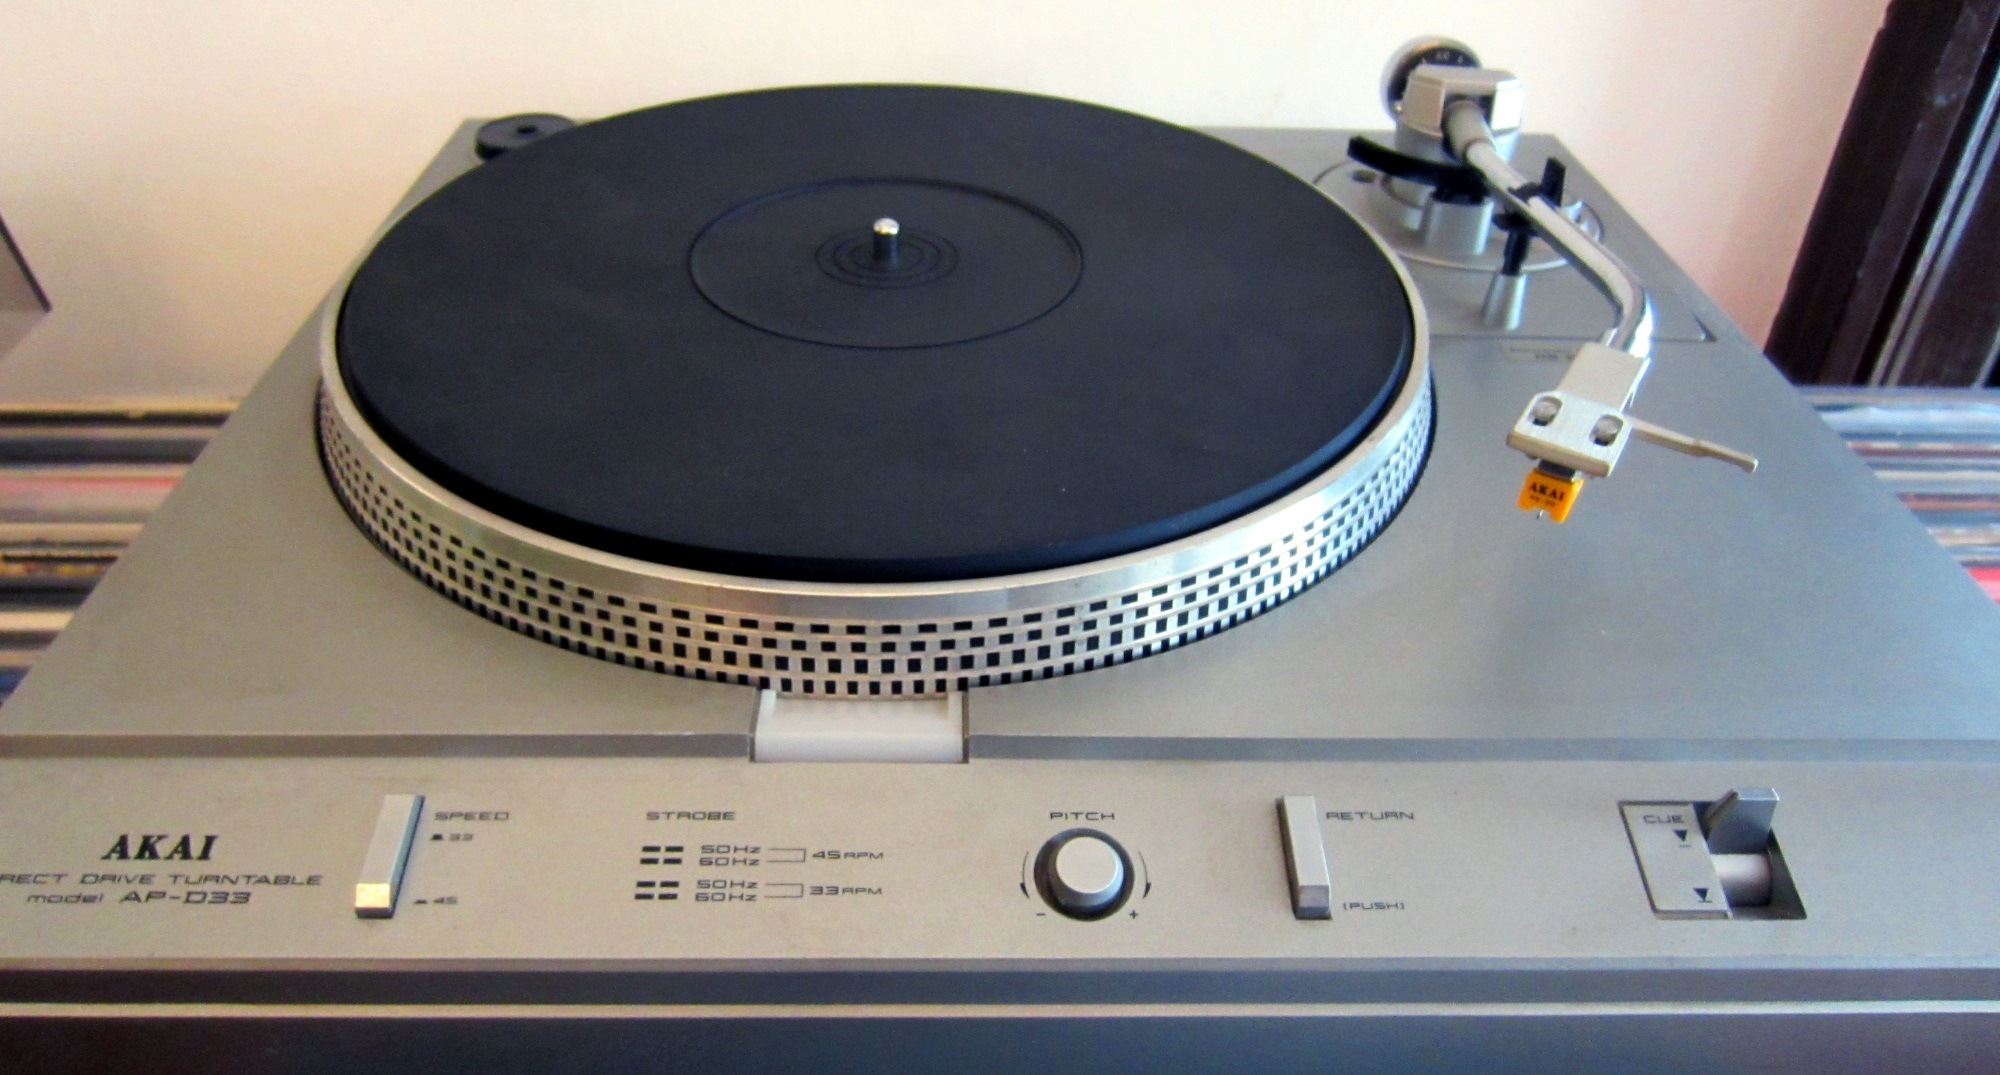 Akai Ap D33 2 Backbeat Books And Music